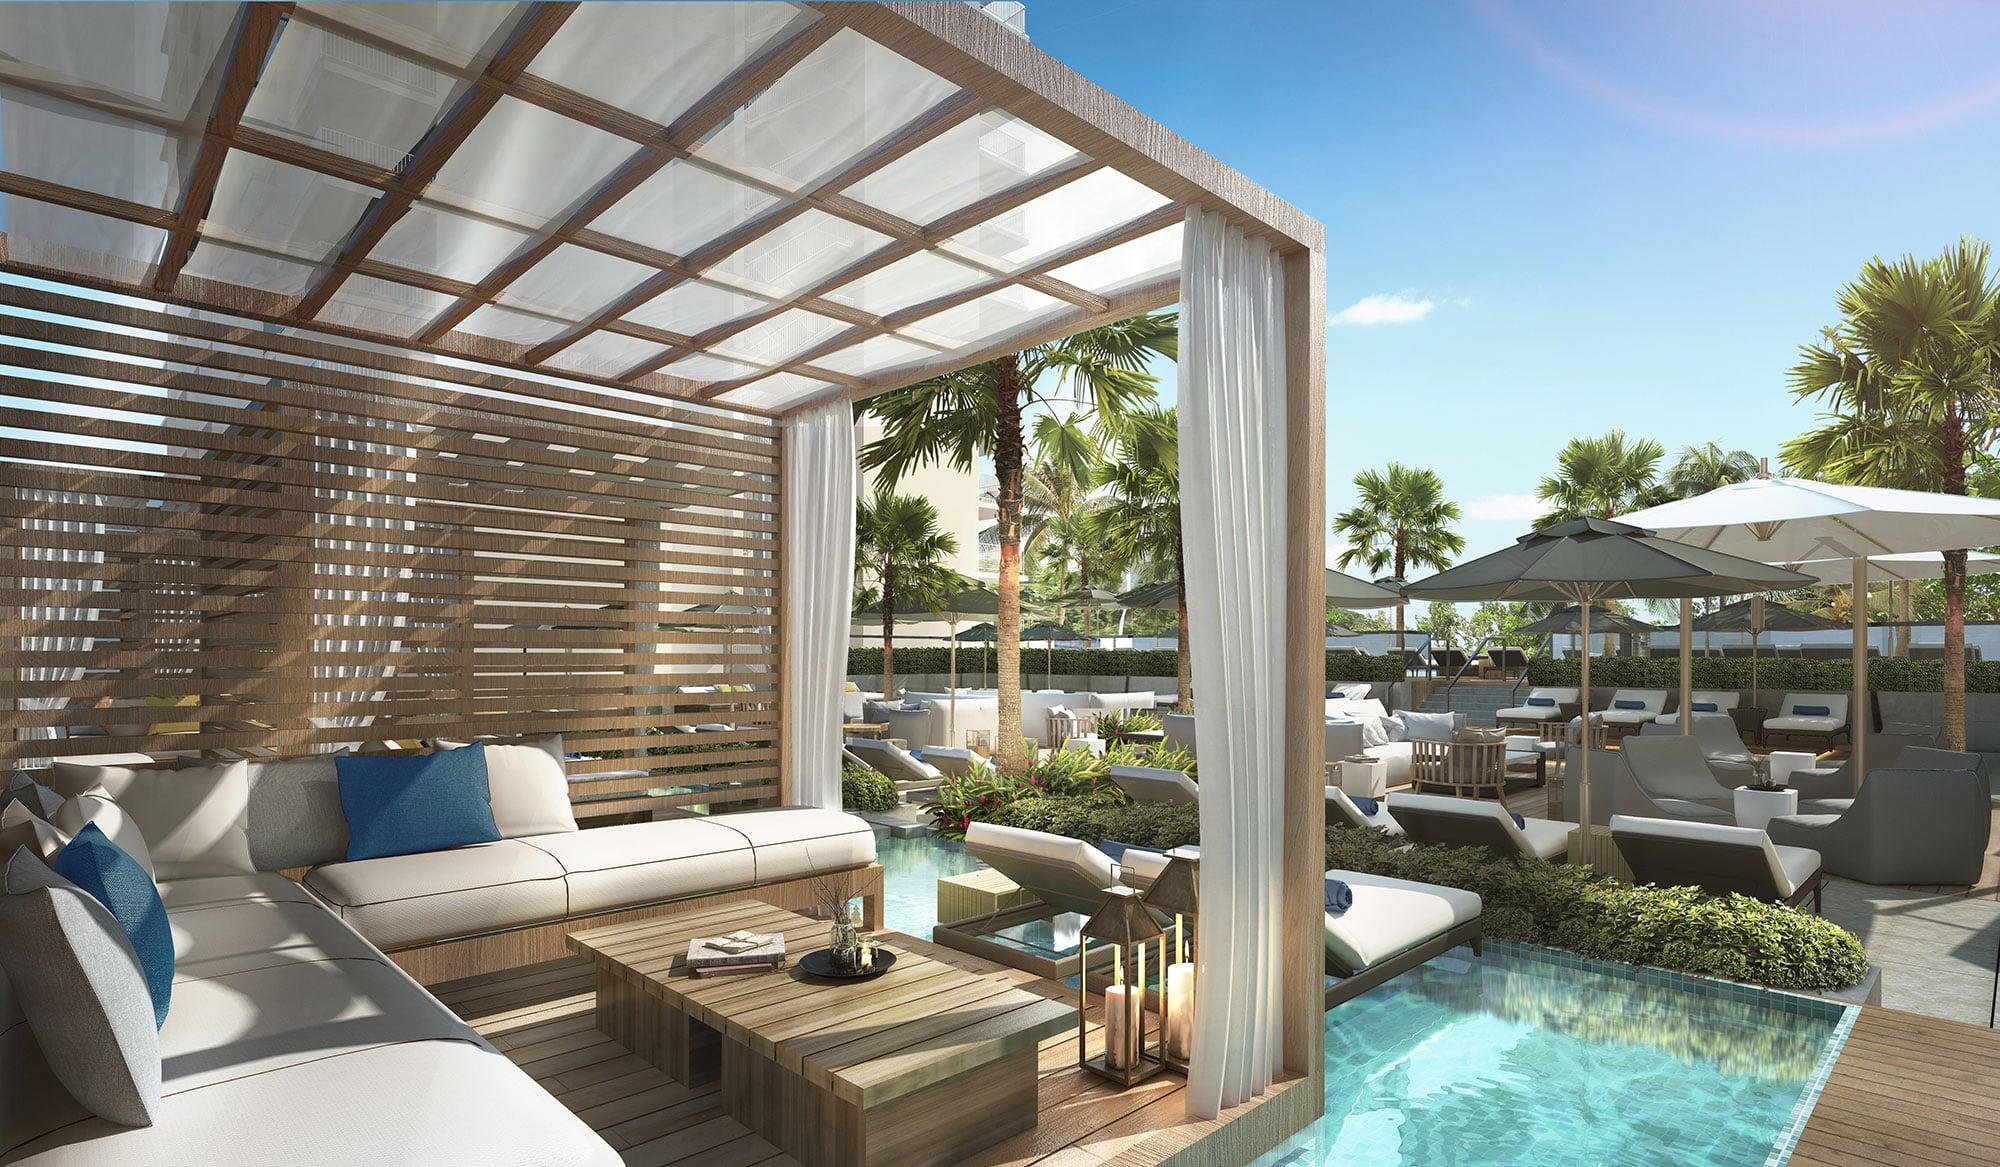 Alohilani resort waikki beach officially launches for Pool design honolulu